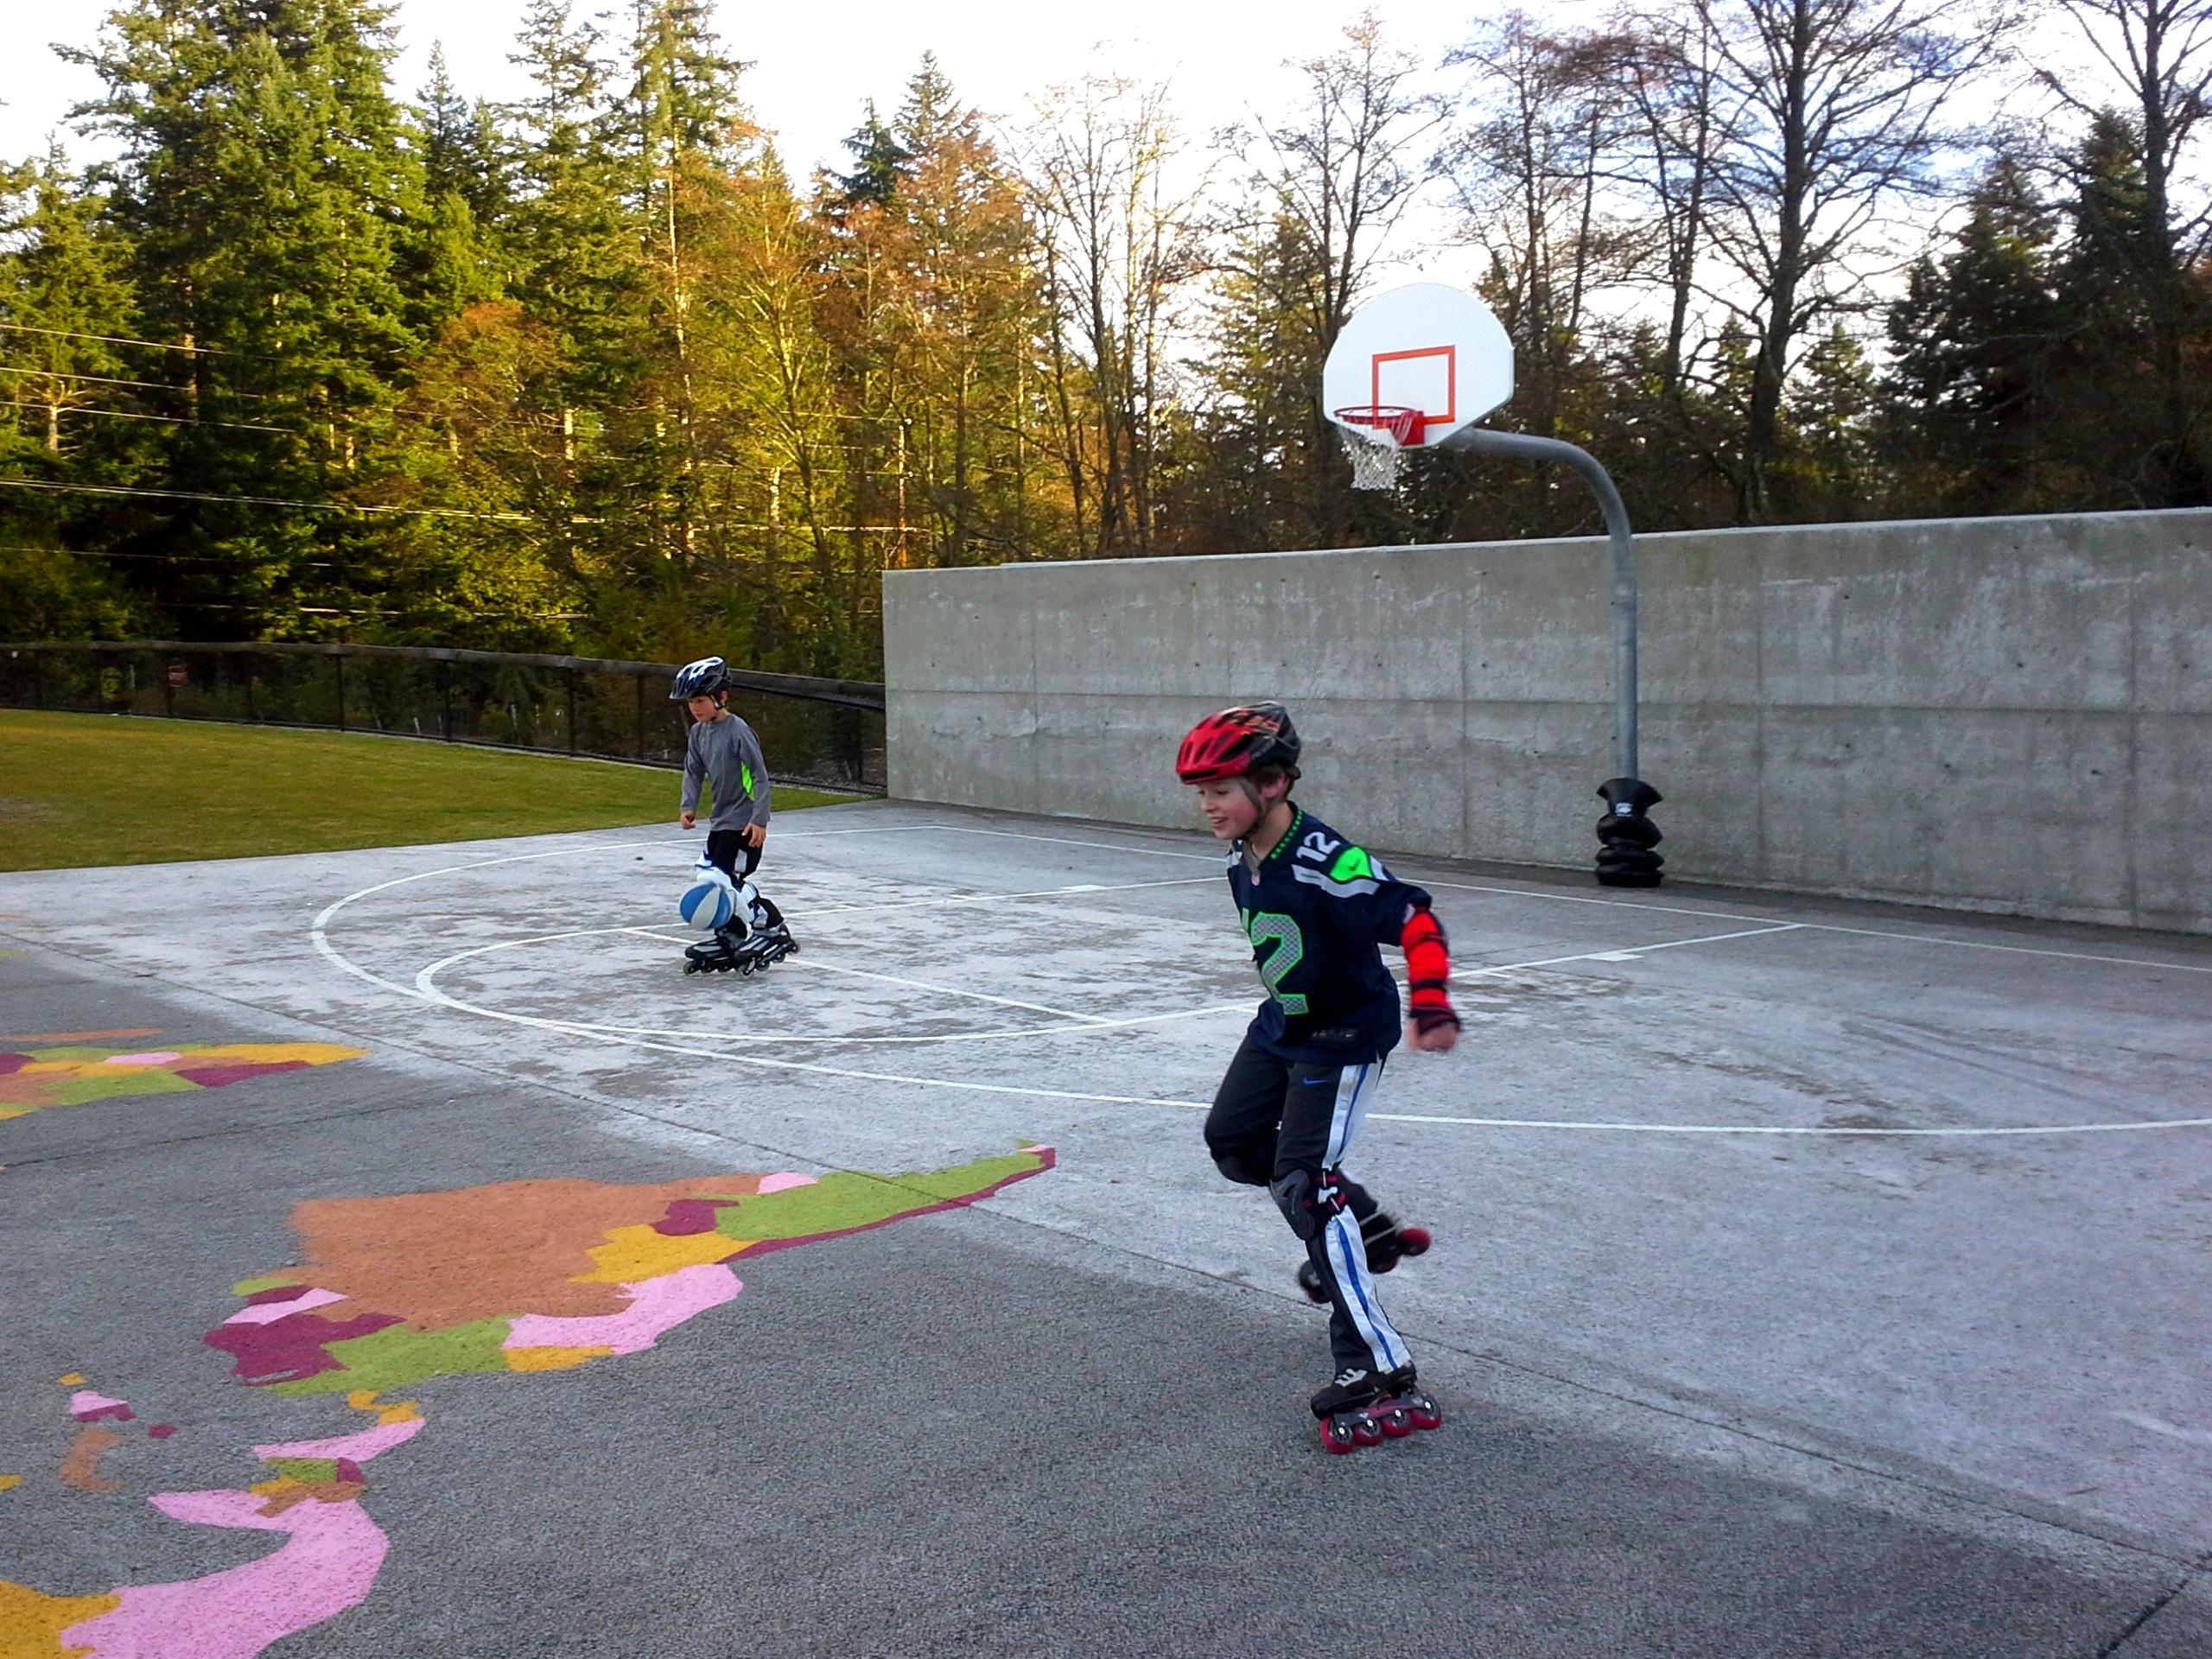 Sam doing basketball on skates! It was really funny.